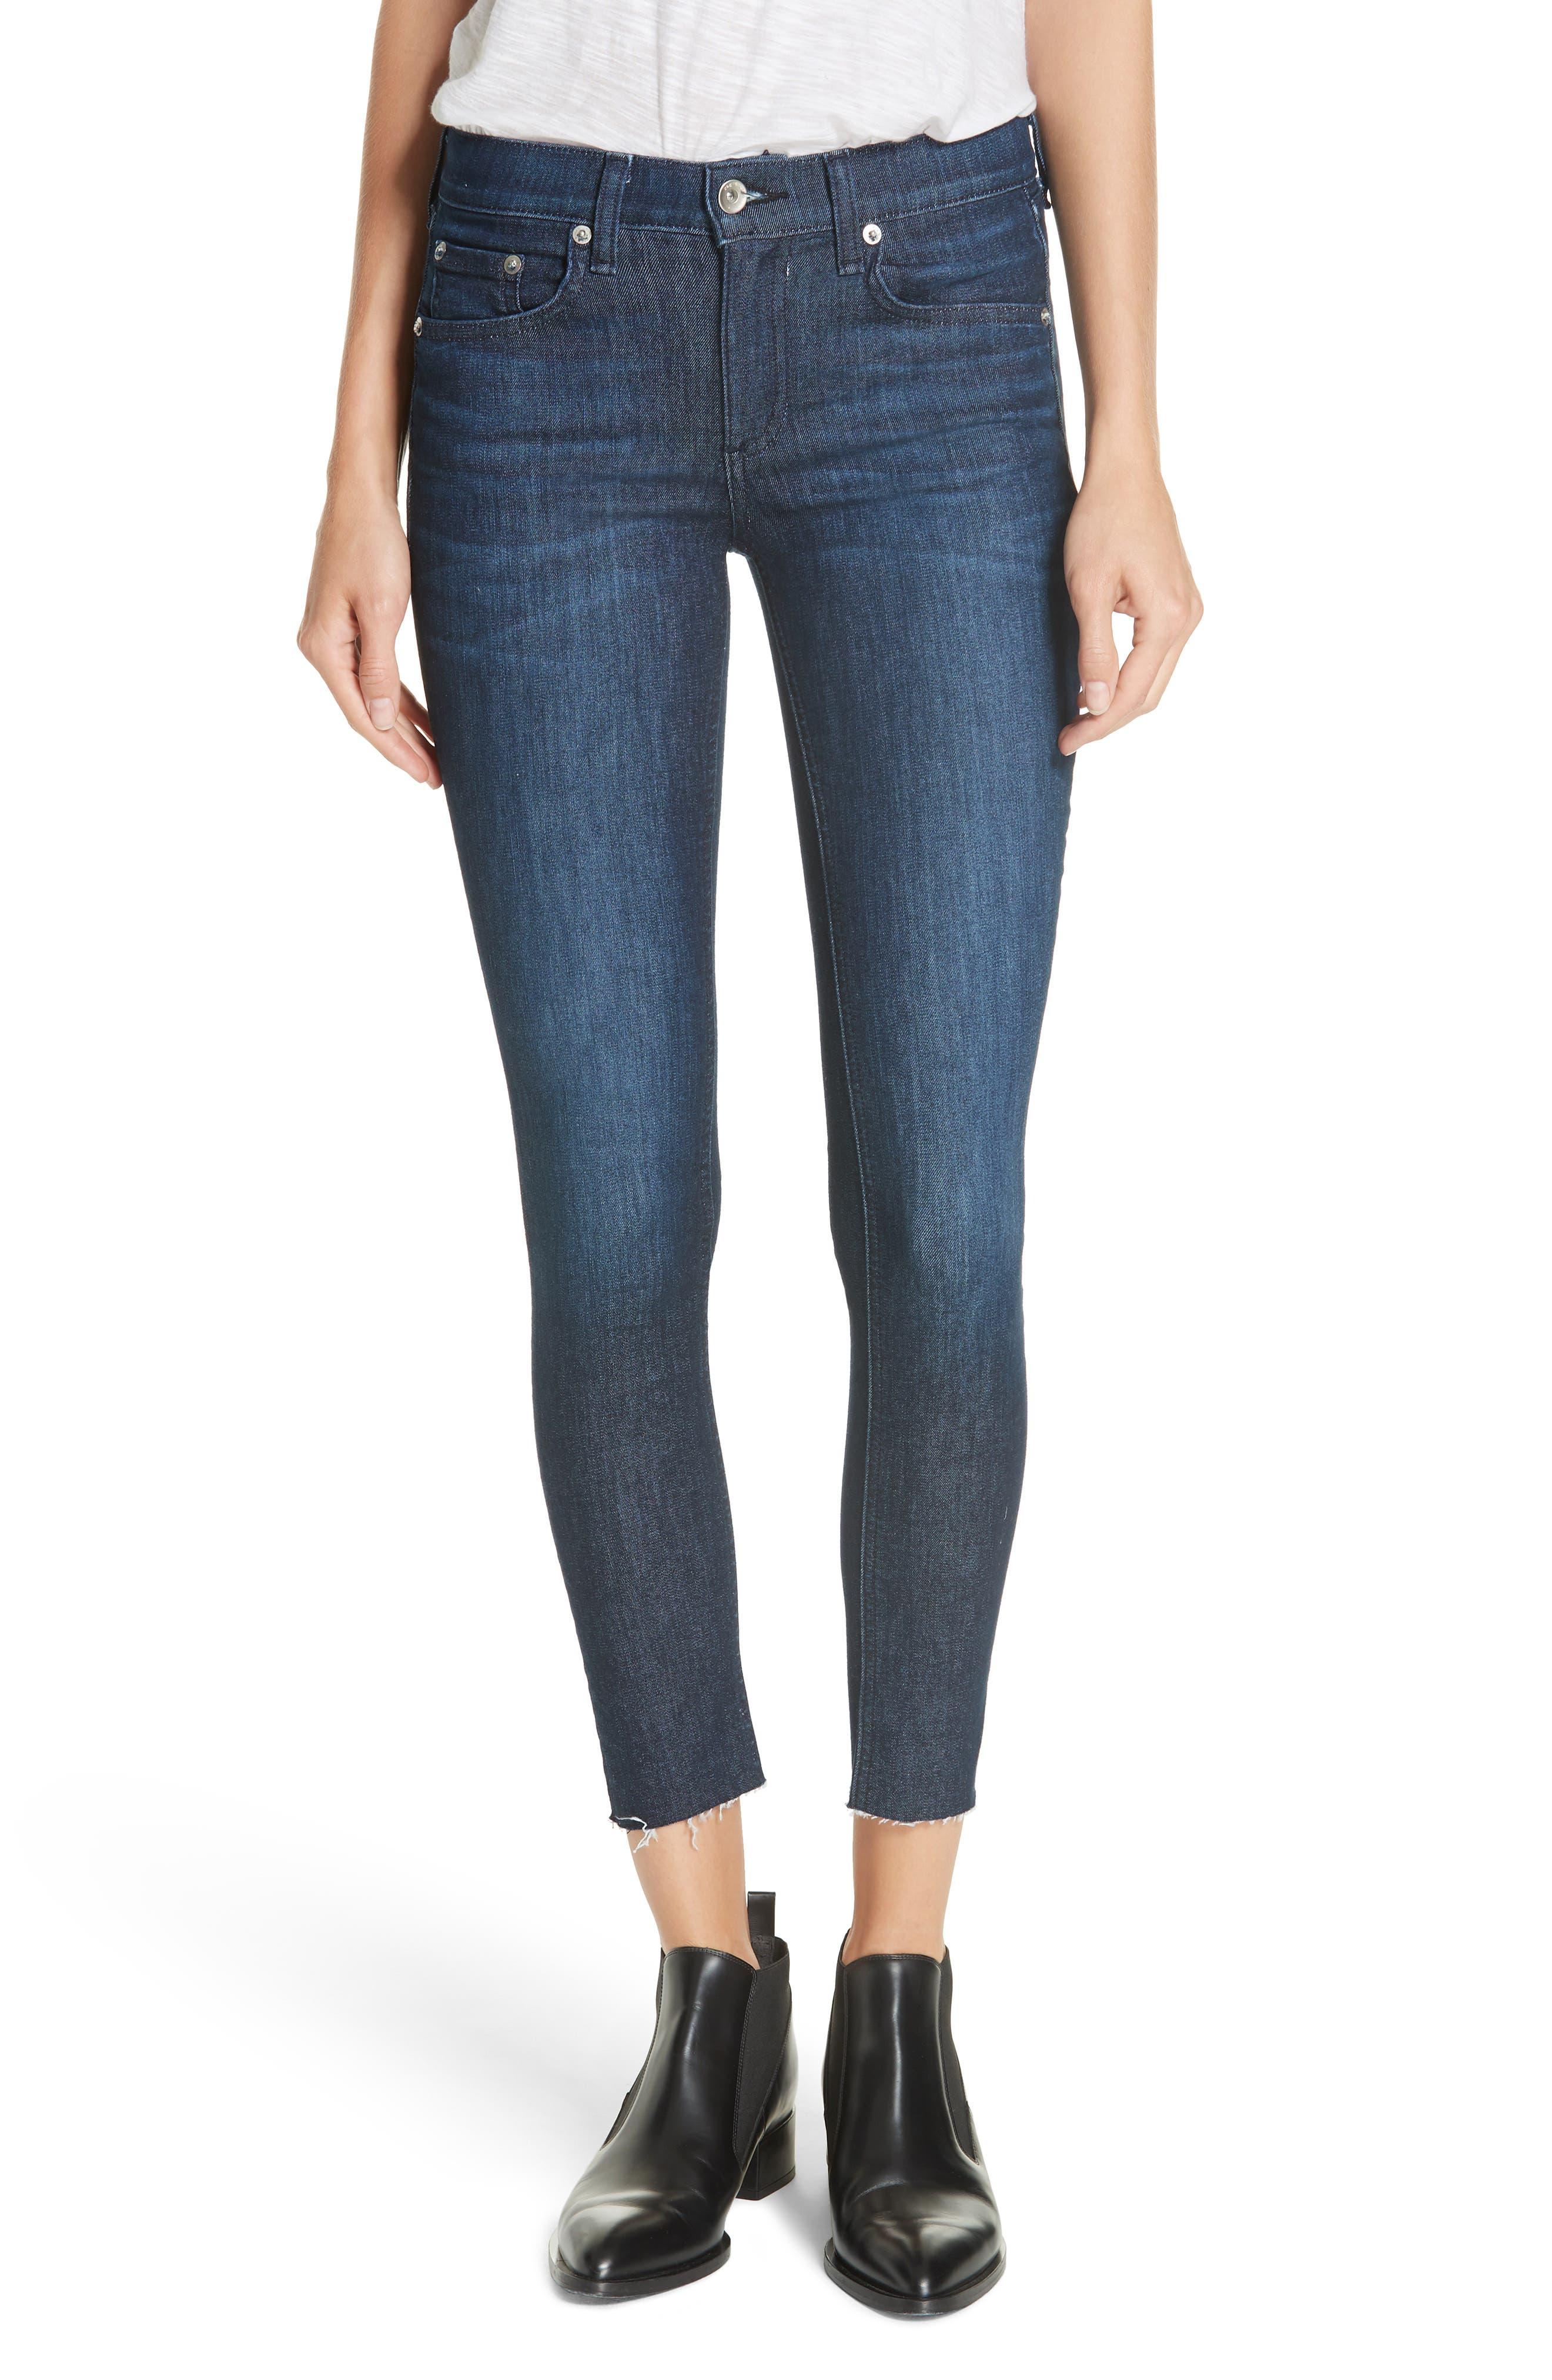 RAG & BONE, Raw Hem Ankle Skinny Jeans, Main thumbnail 1, color, TONAL RIVER